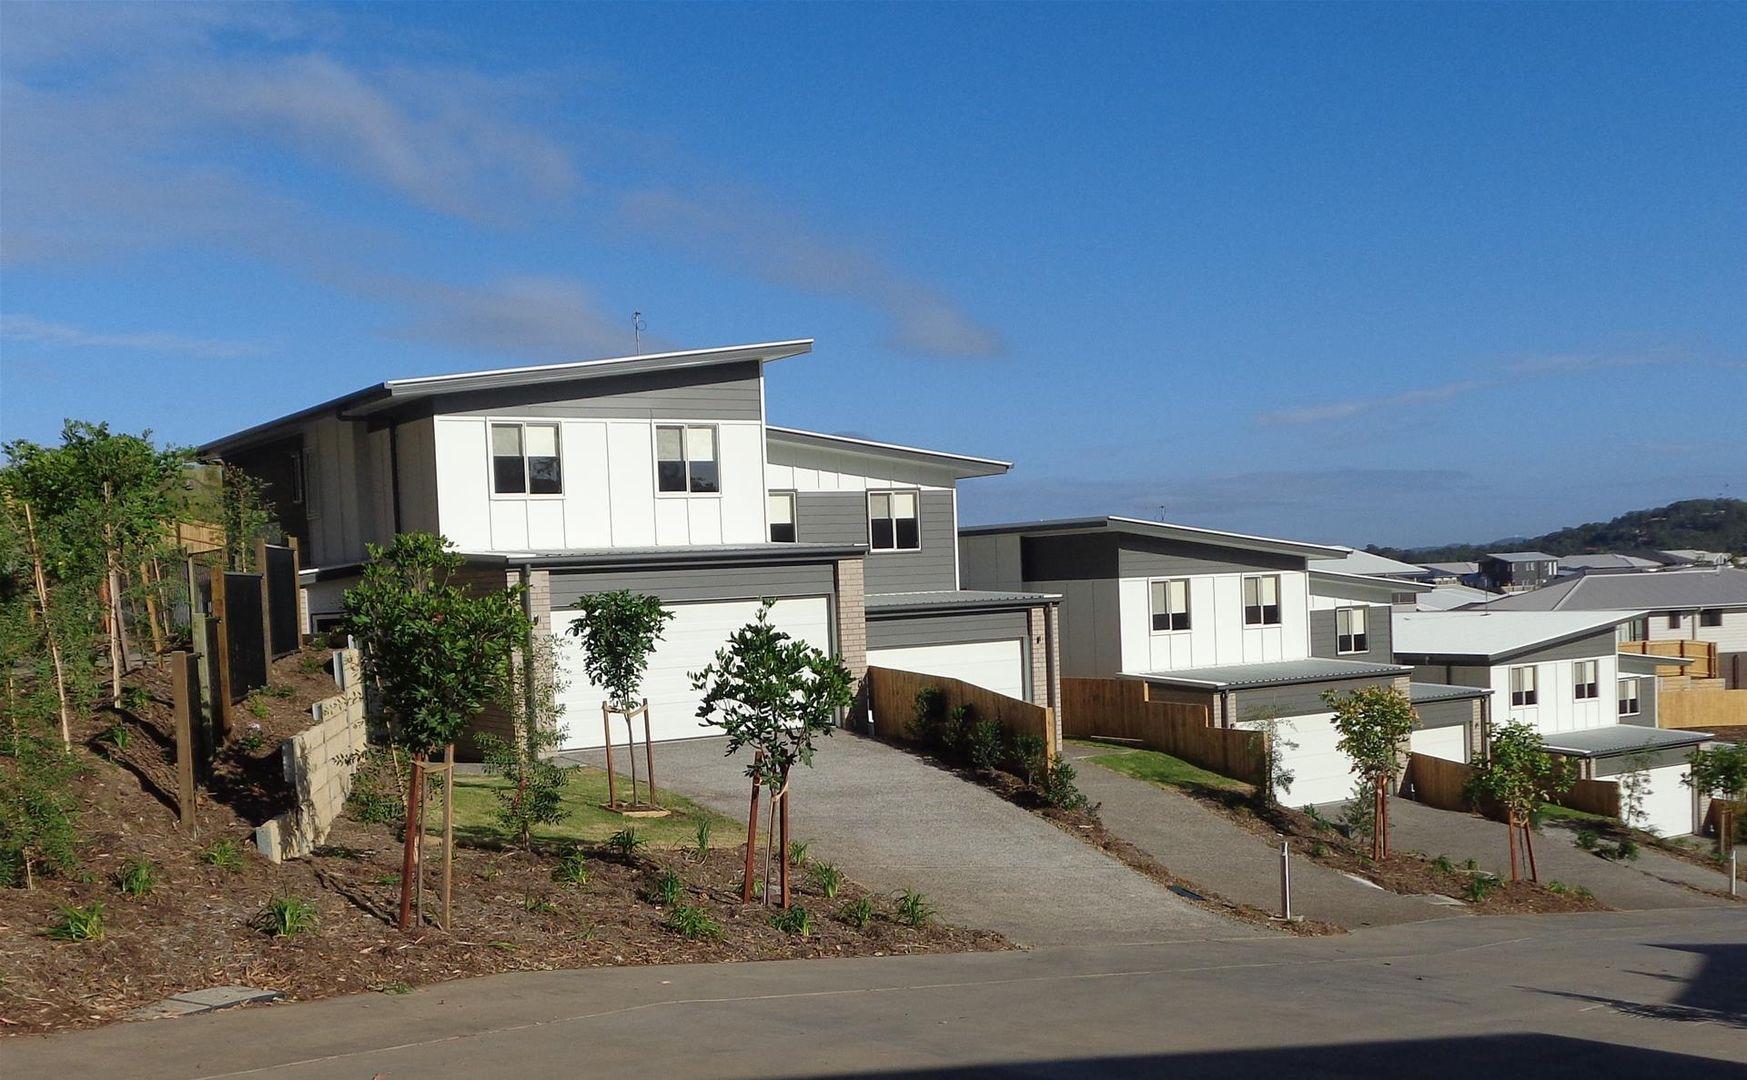 7/23 Oakwood Street, Pimpama QLD 4209, Image 0